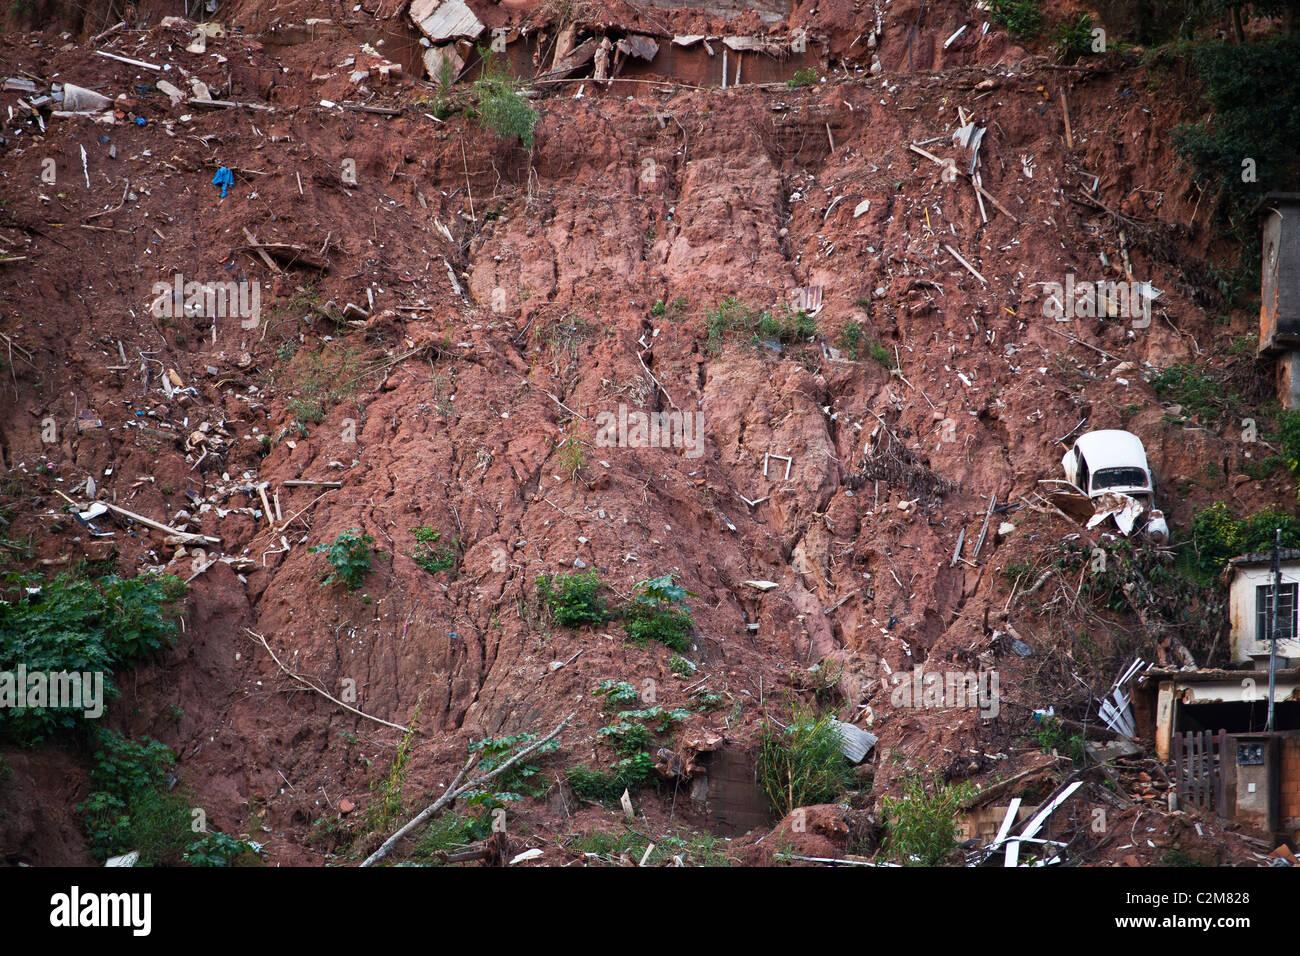 January 2011 Nova Friburgo flooding Rio de Janeiro State Brazil Landslide at Vilage quarter - Stock Image